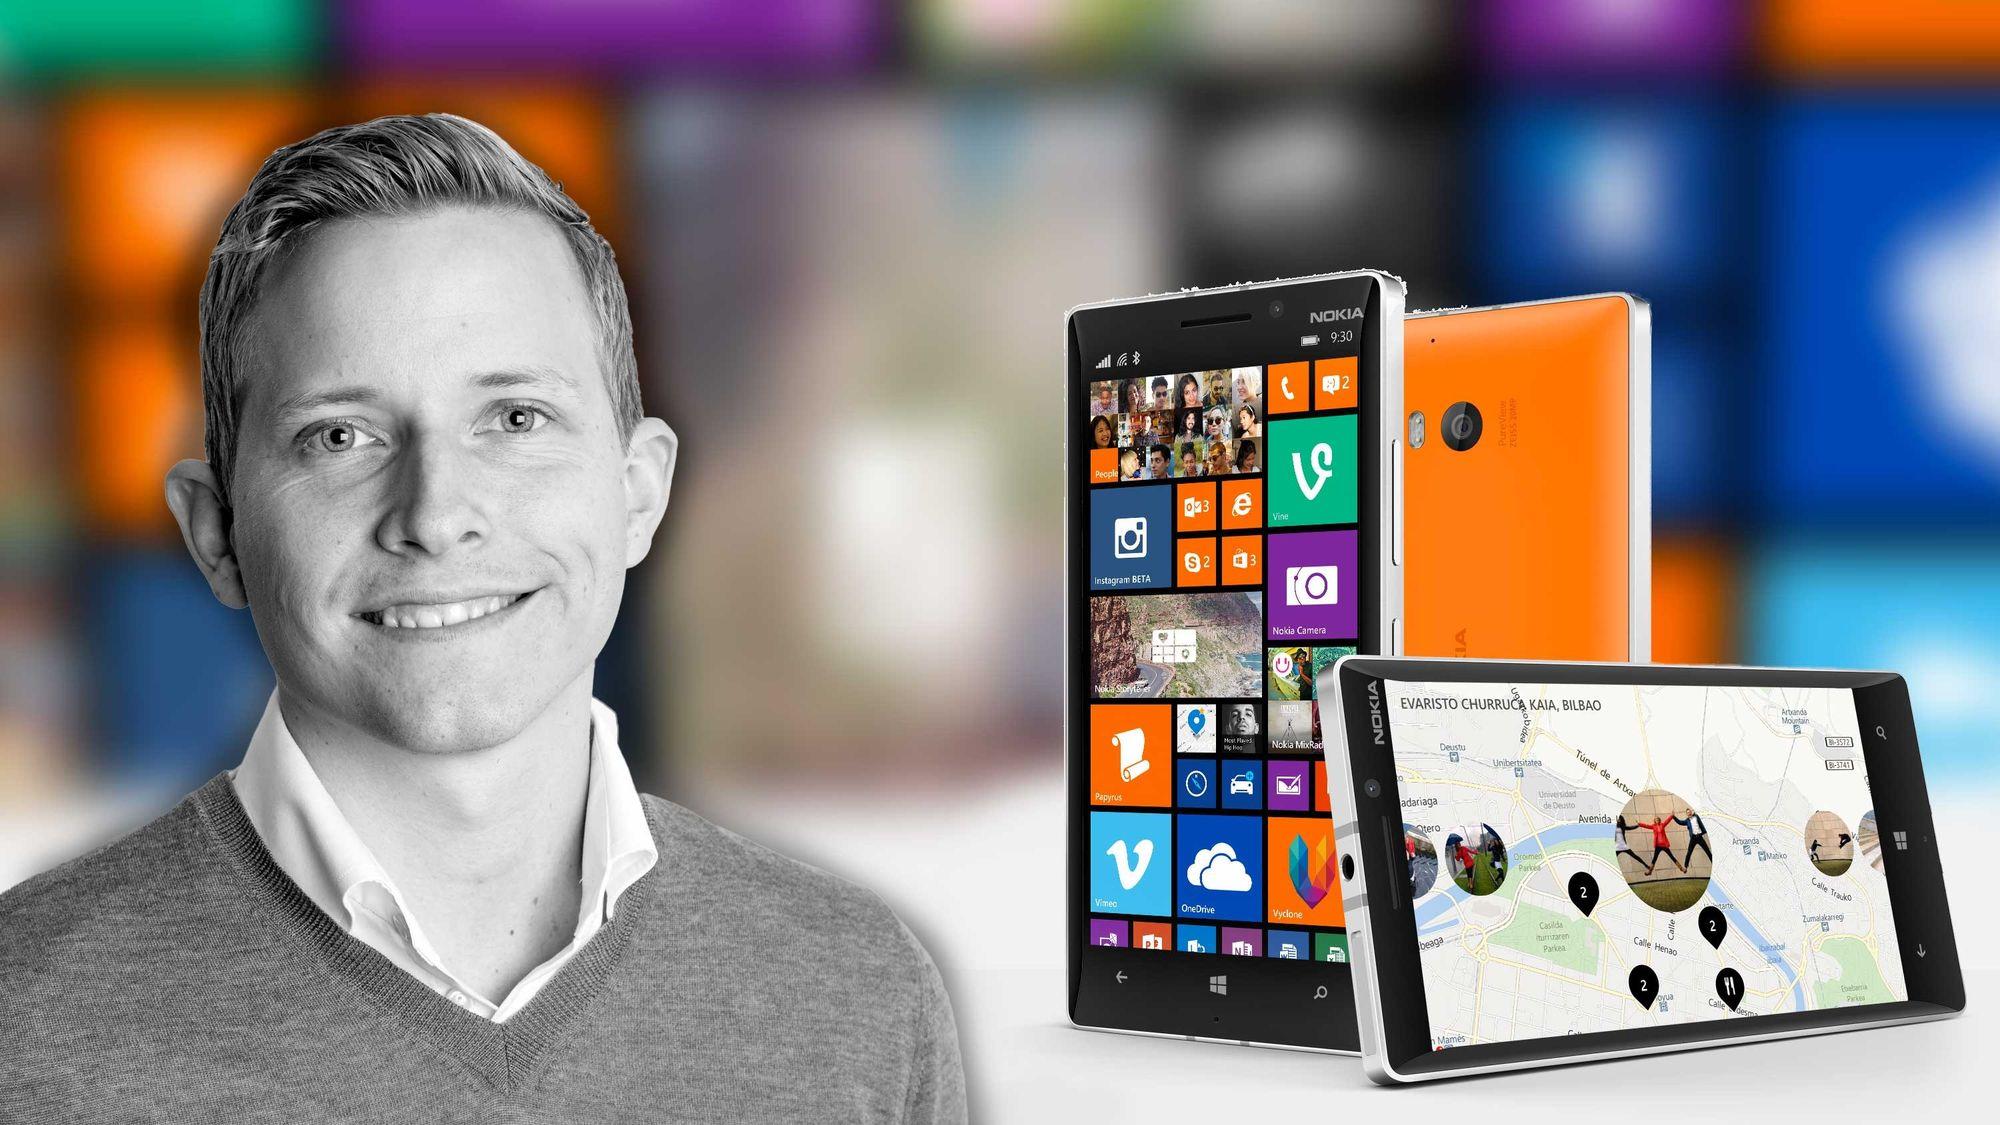 Les – Windows Phone er jo genialt